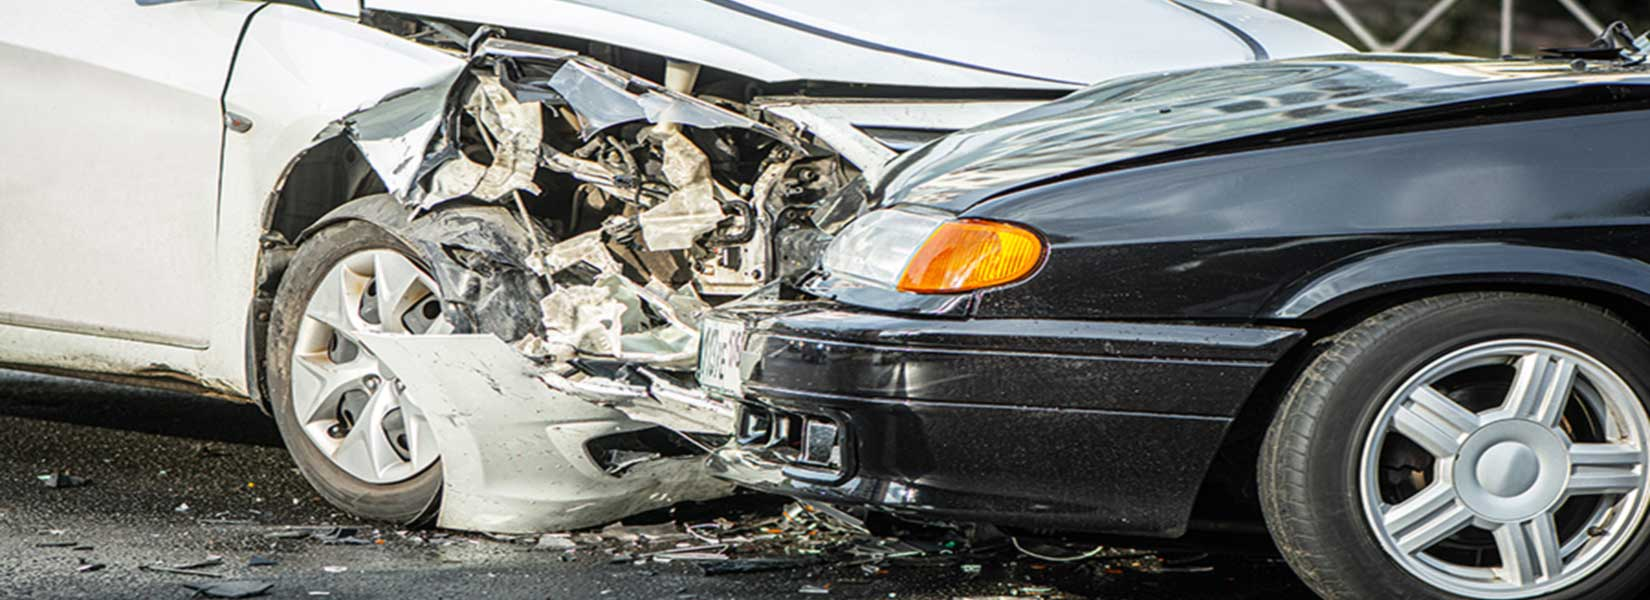 atlanta-car-crash-lawyers-occupant-ejection